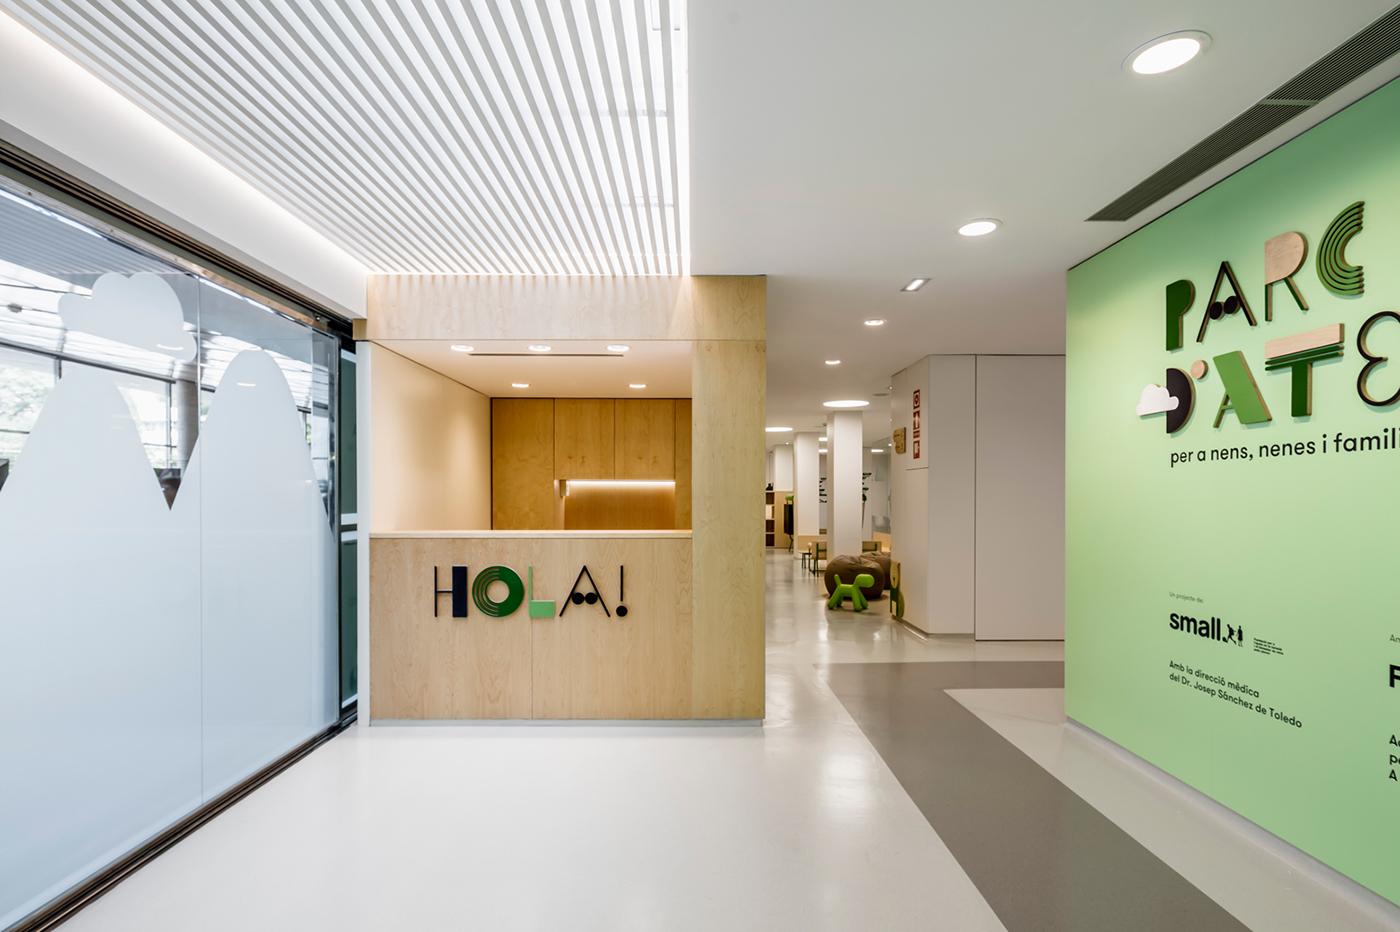 rgb_creative_ParcdAtencions_hospital_design_03